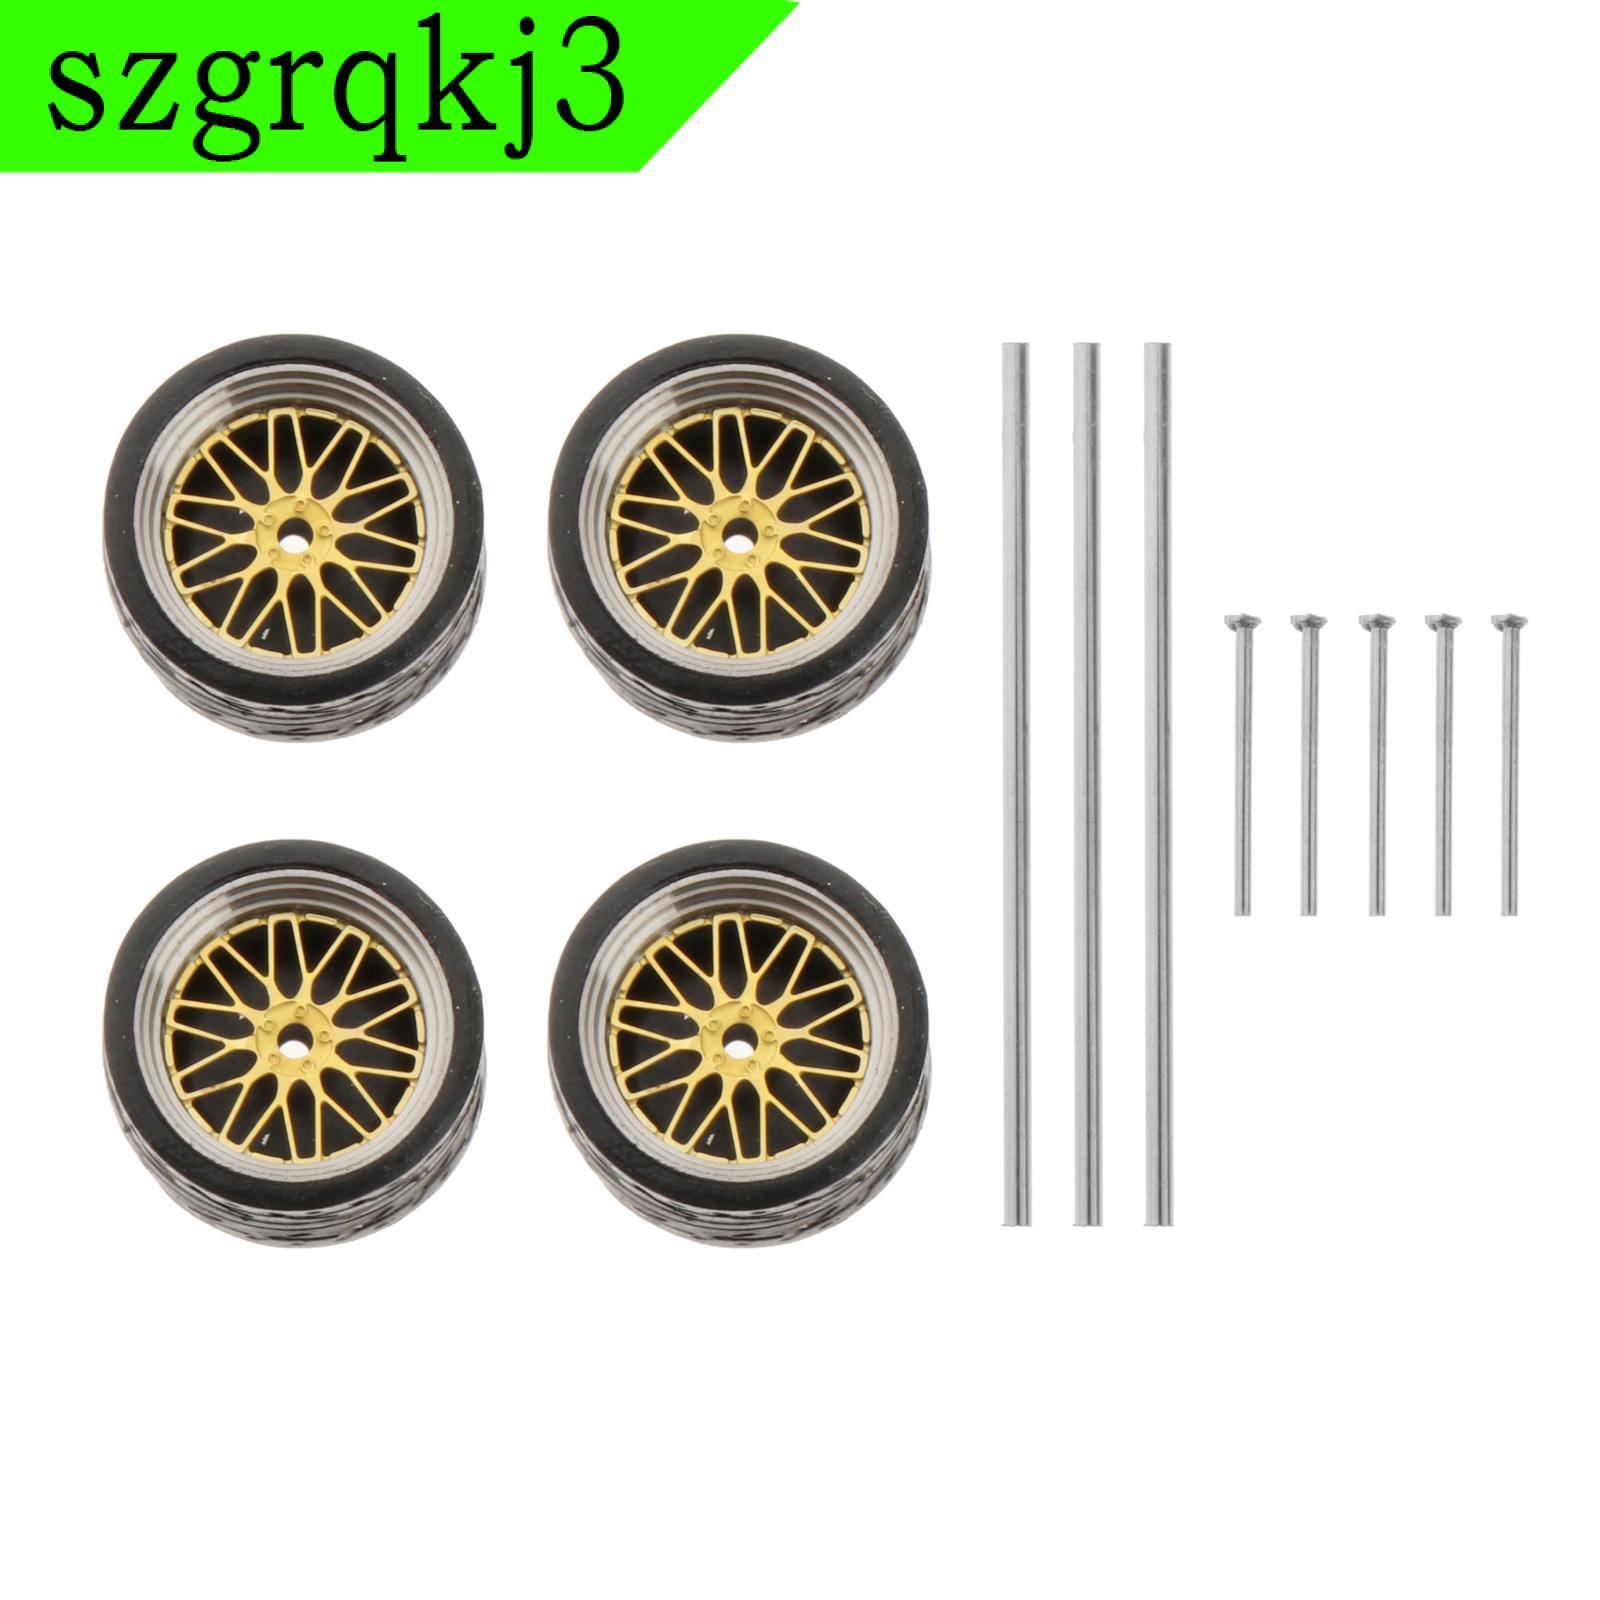 WenZhen Music 1:64比例壓鑄賽車模型車輪和輪胎組配件風格A